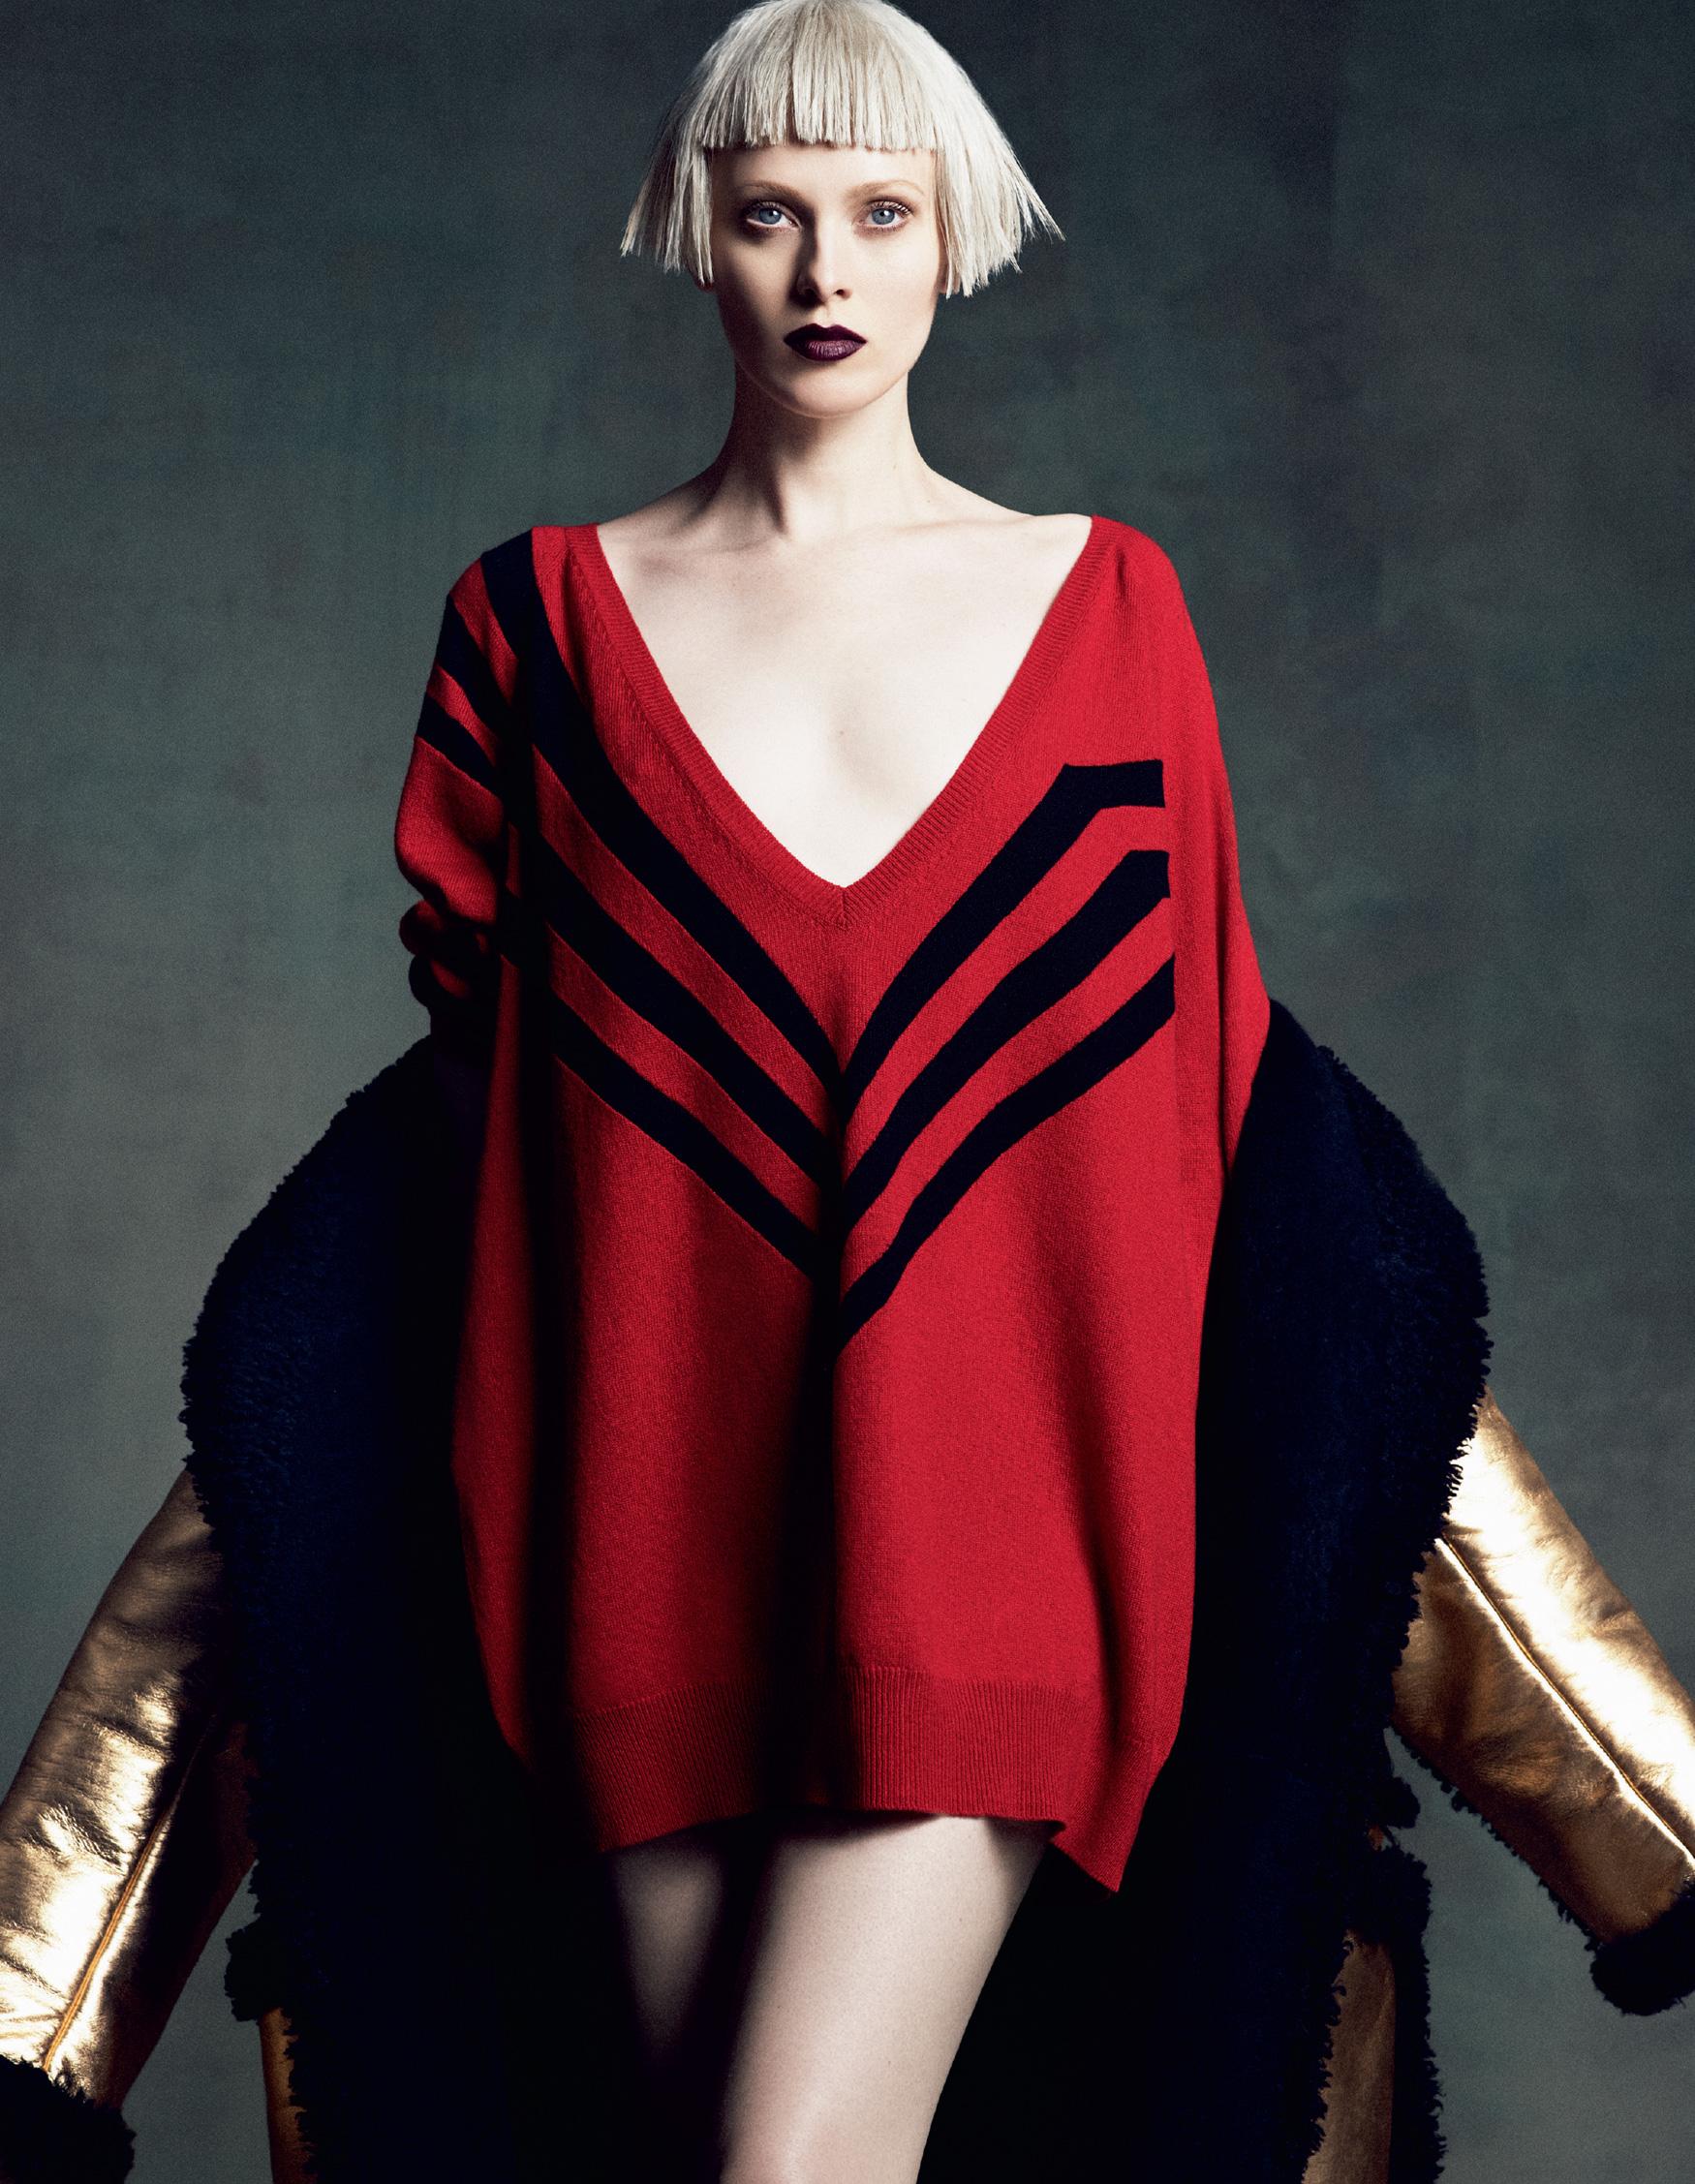 Giovanna-Battaglia-The-Icons-Of-Perfections-Vogue-Japan-15th-Anniversary-Issue-Luigi-Iango-V181_245_200-22.jpg